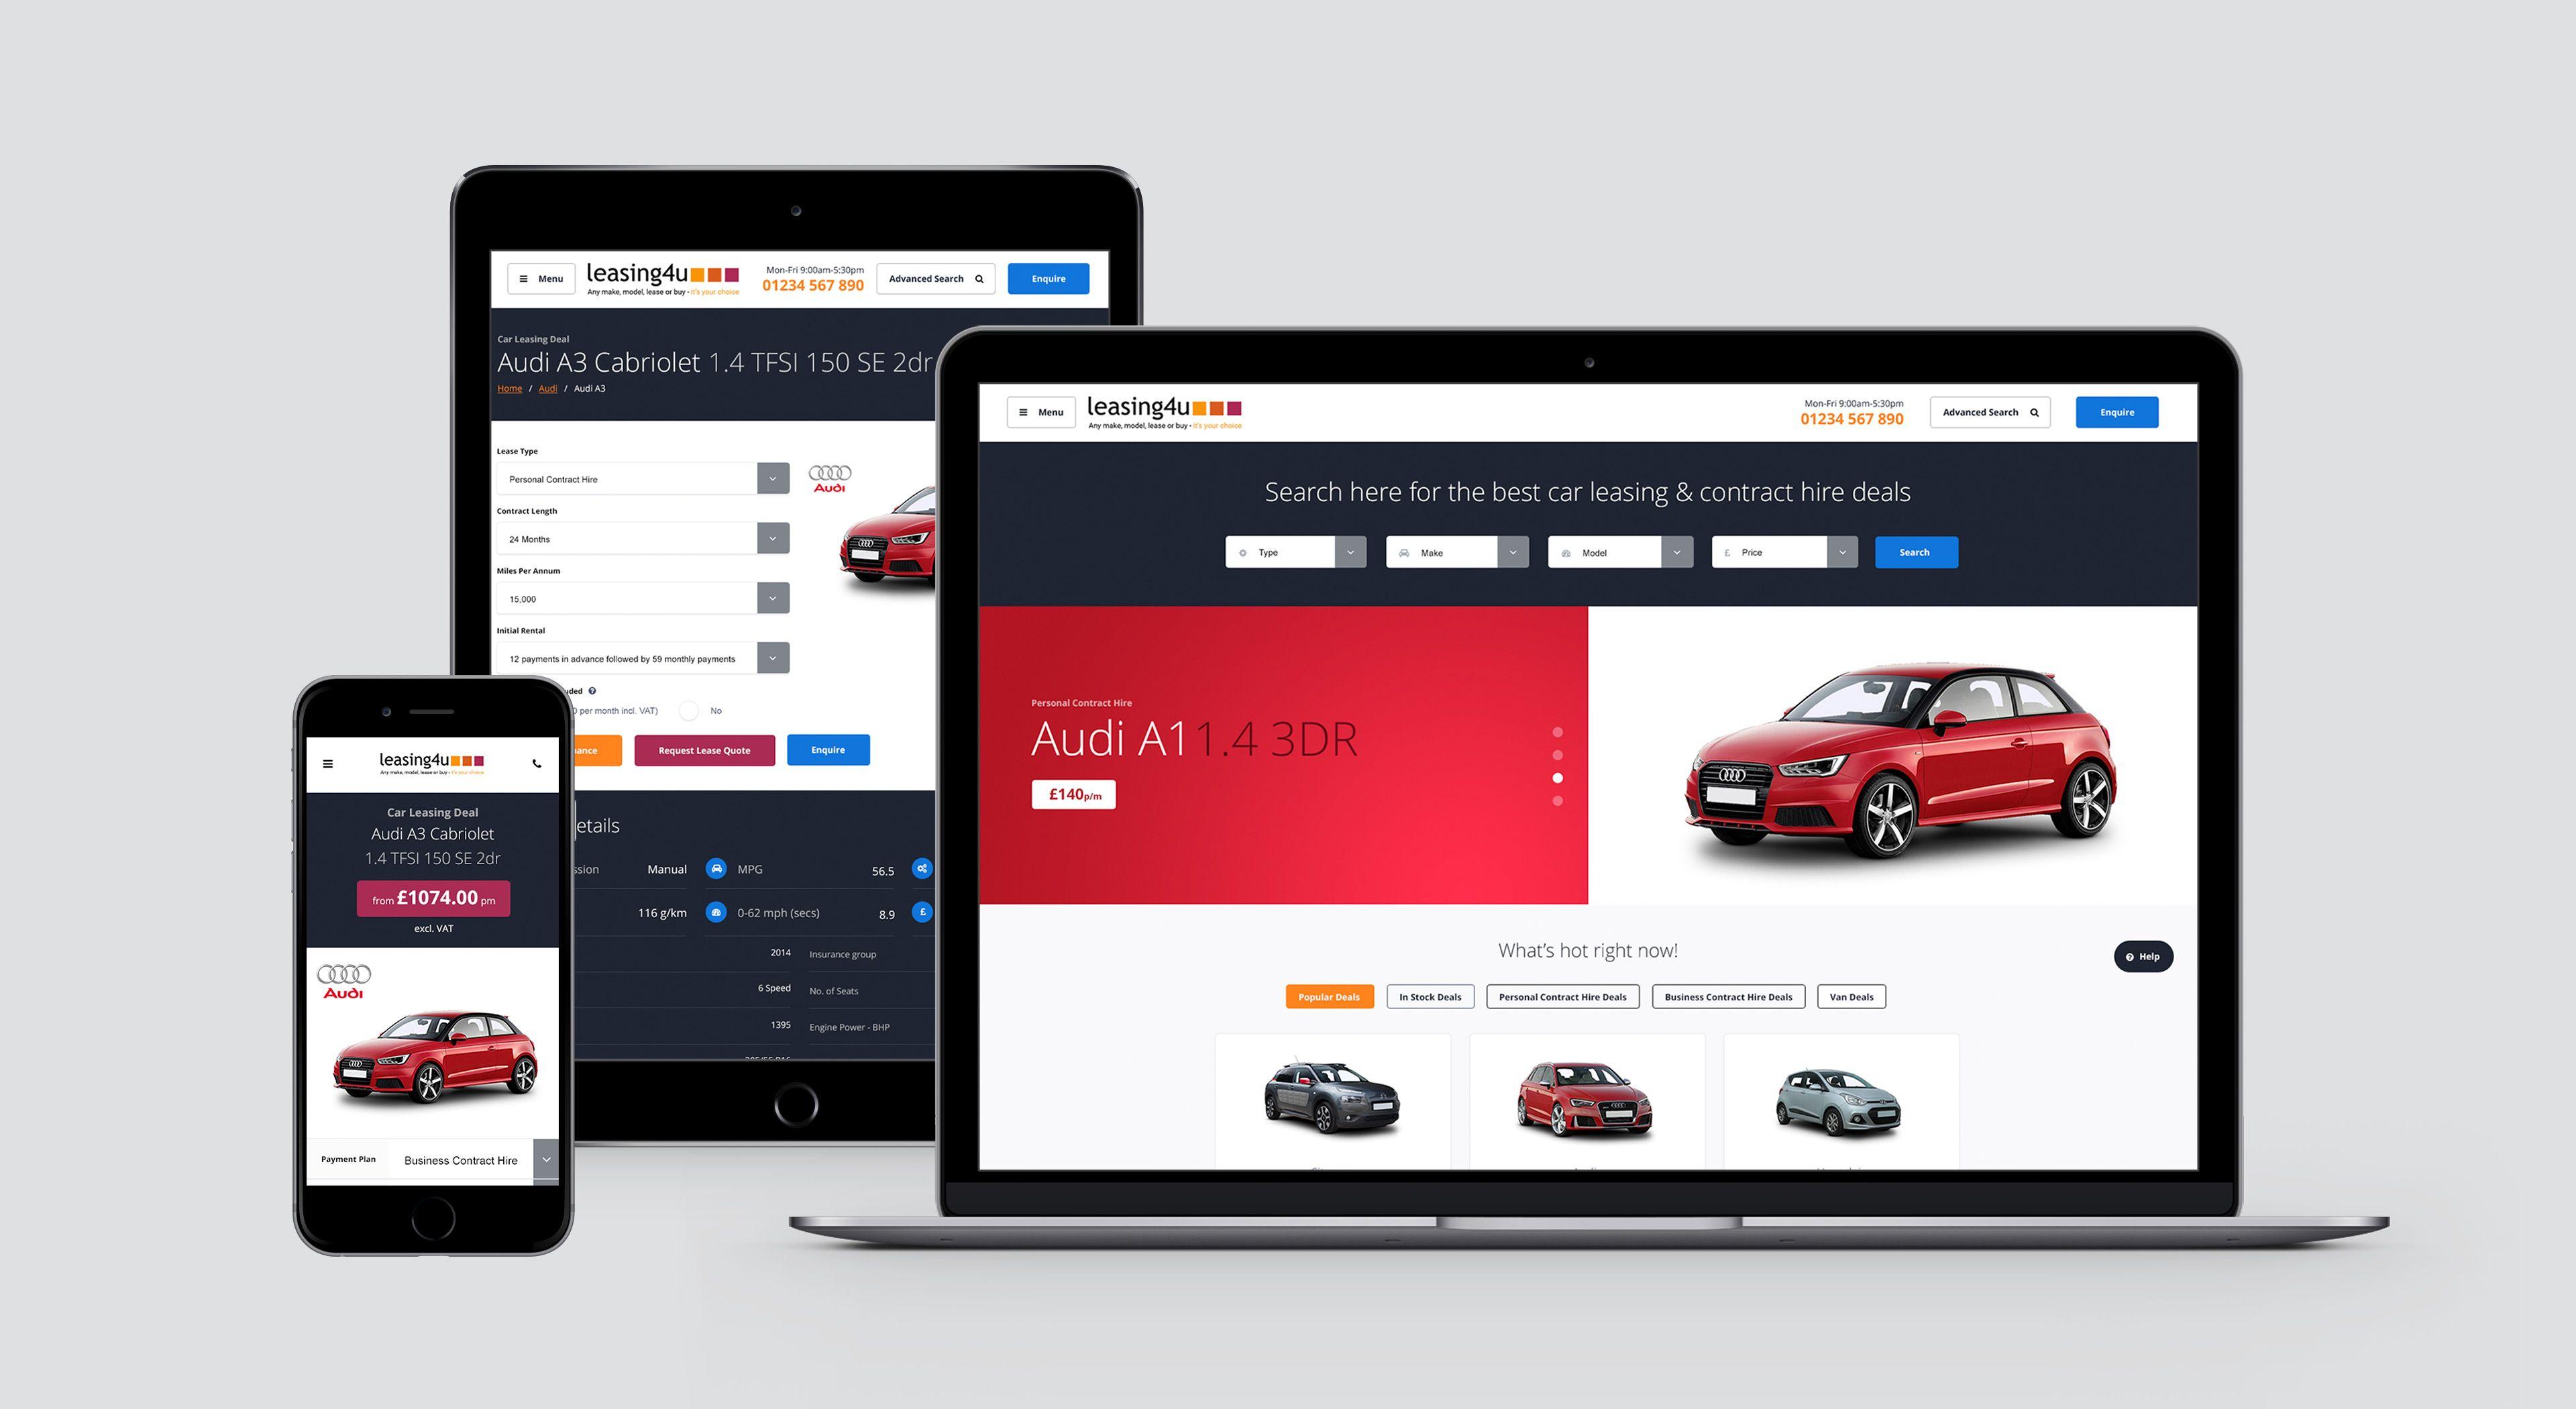 Leasing4u Automotive Website Design By Csi Media In Cheshire Website Design Web Design Agency Web Development Projects